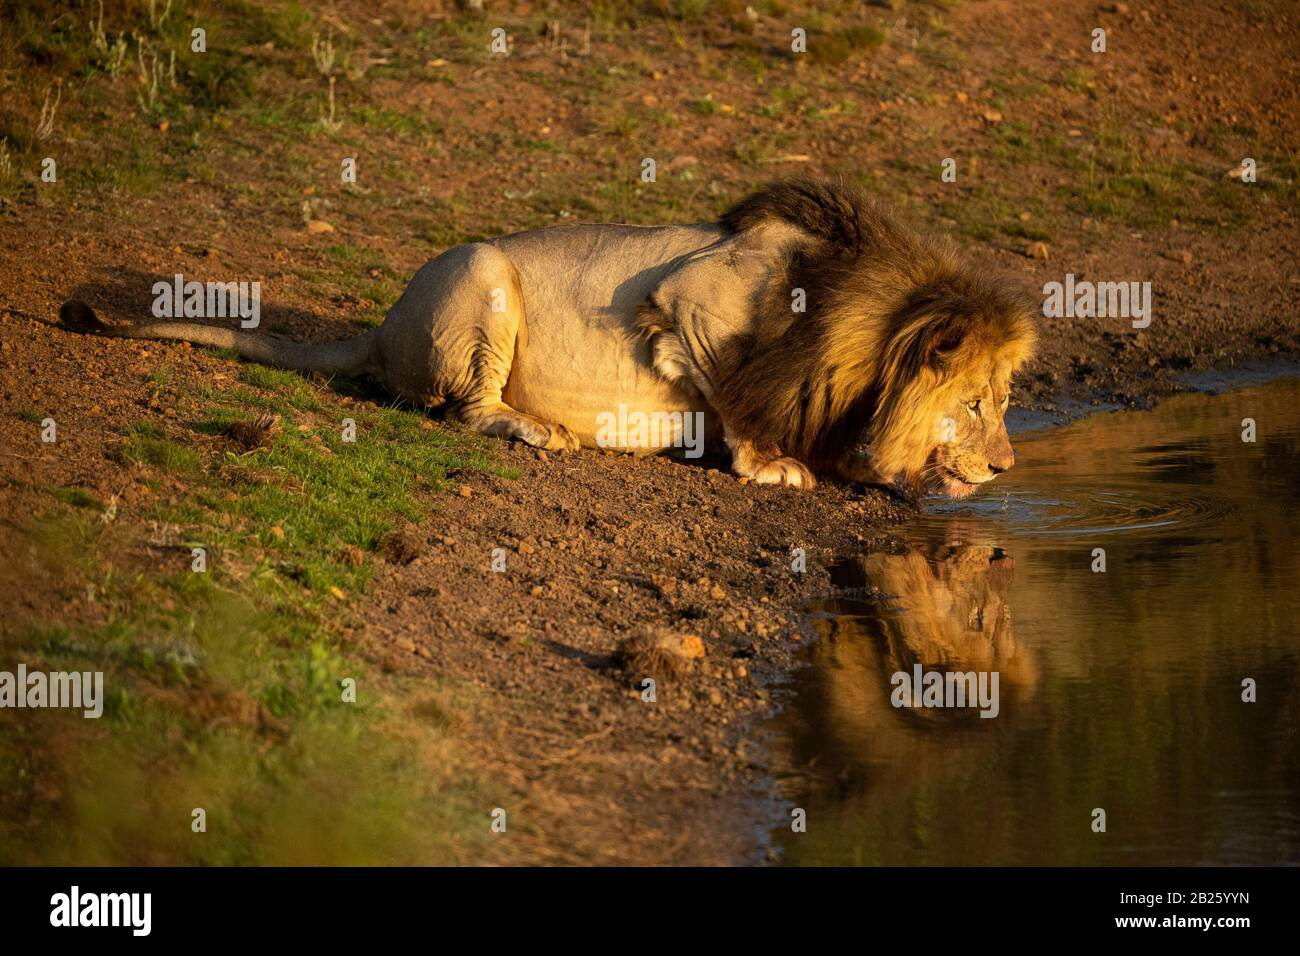 León macho beber, Panthera leo, Gondwana Game Reserve, Sudáfrica Foto de stock